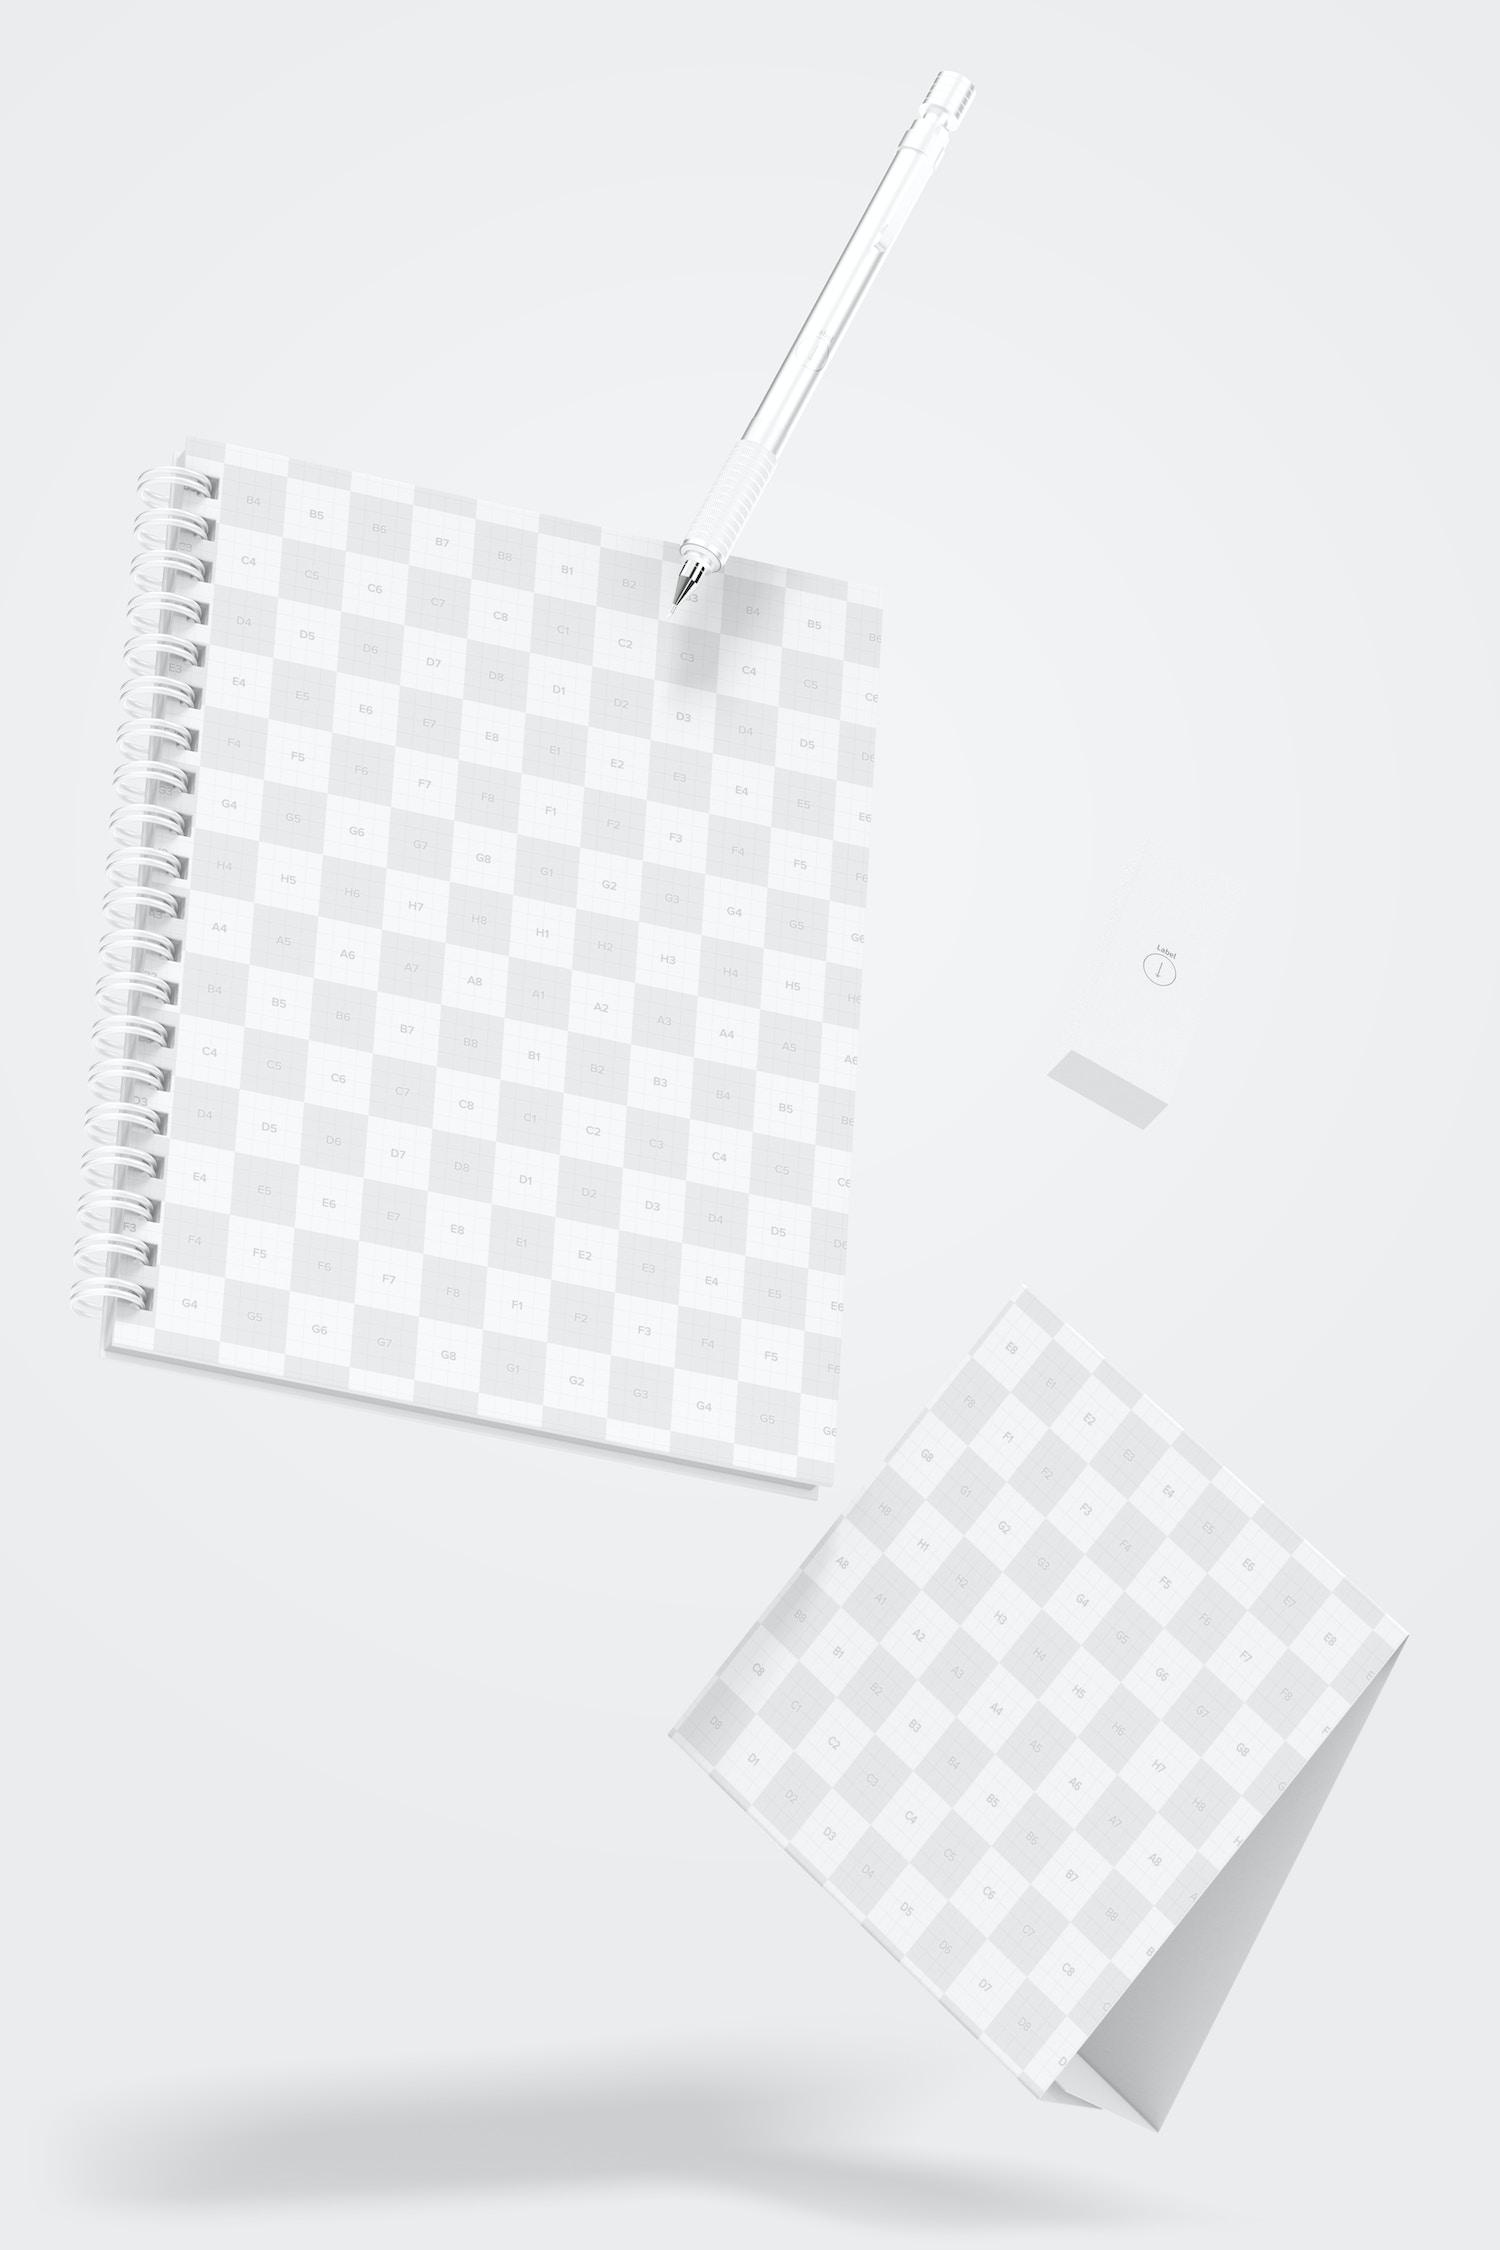 Wire Bound Notepad Scene Mockup, Falling